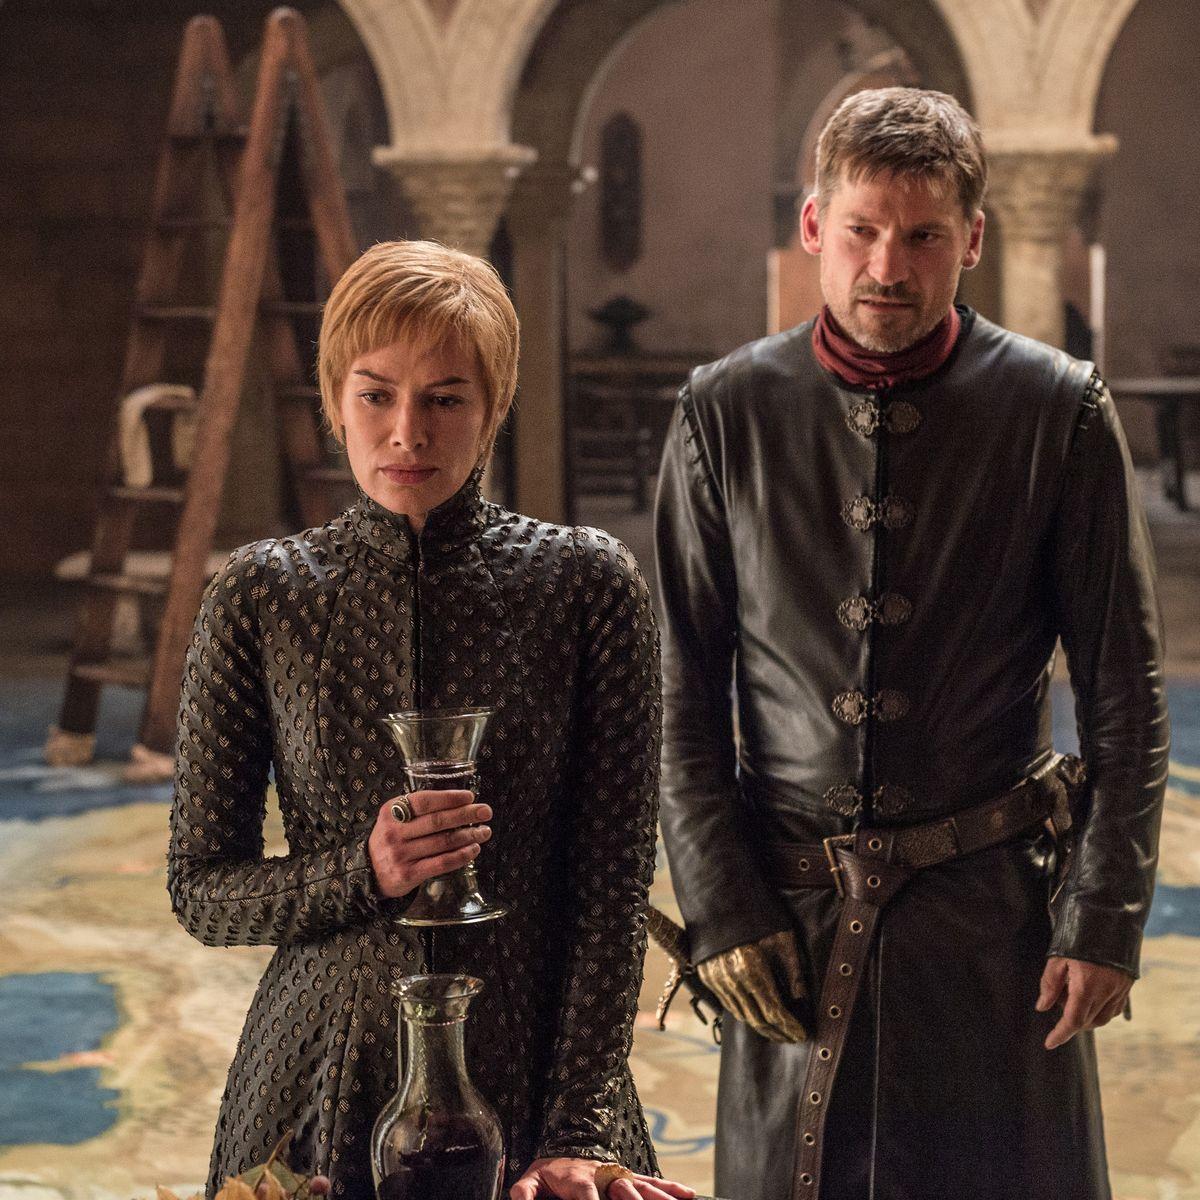 Game-of-Thrones-725_0.jpg